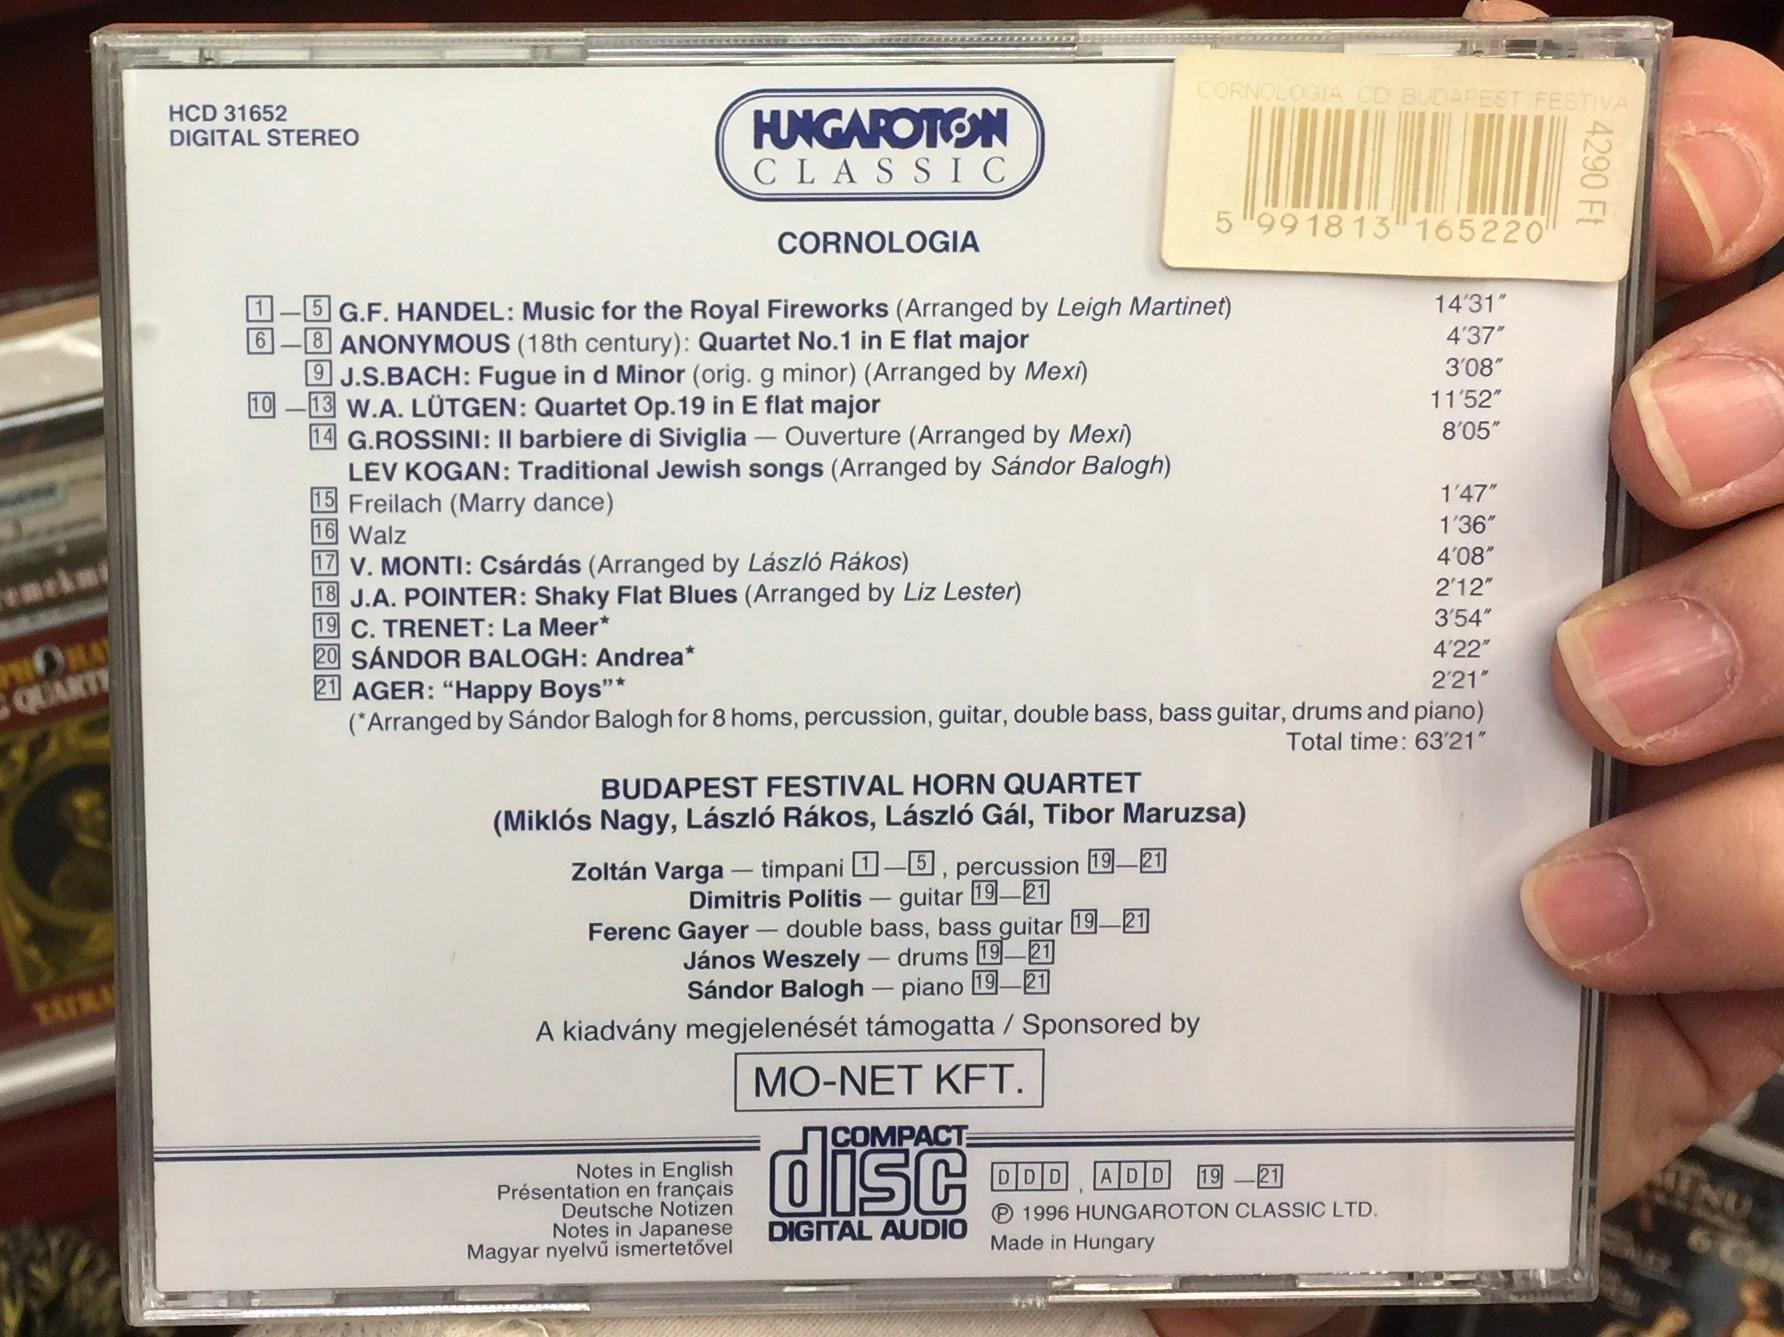 cornologia-bach-handel-rossini-monti-budapest-festival-horn-quartet-hungaroton-classic-audio-cd-1996-stereo-hcd-31652-2-.jpg